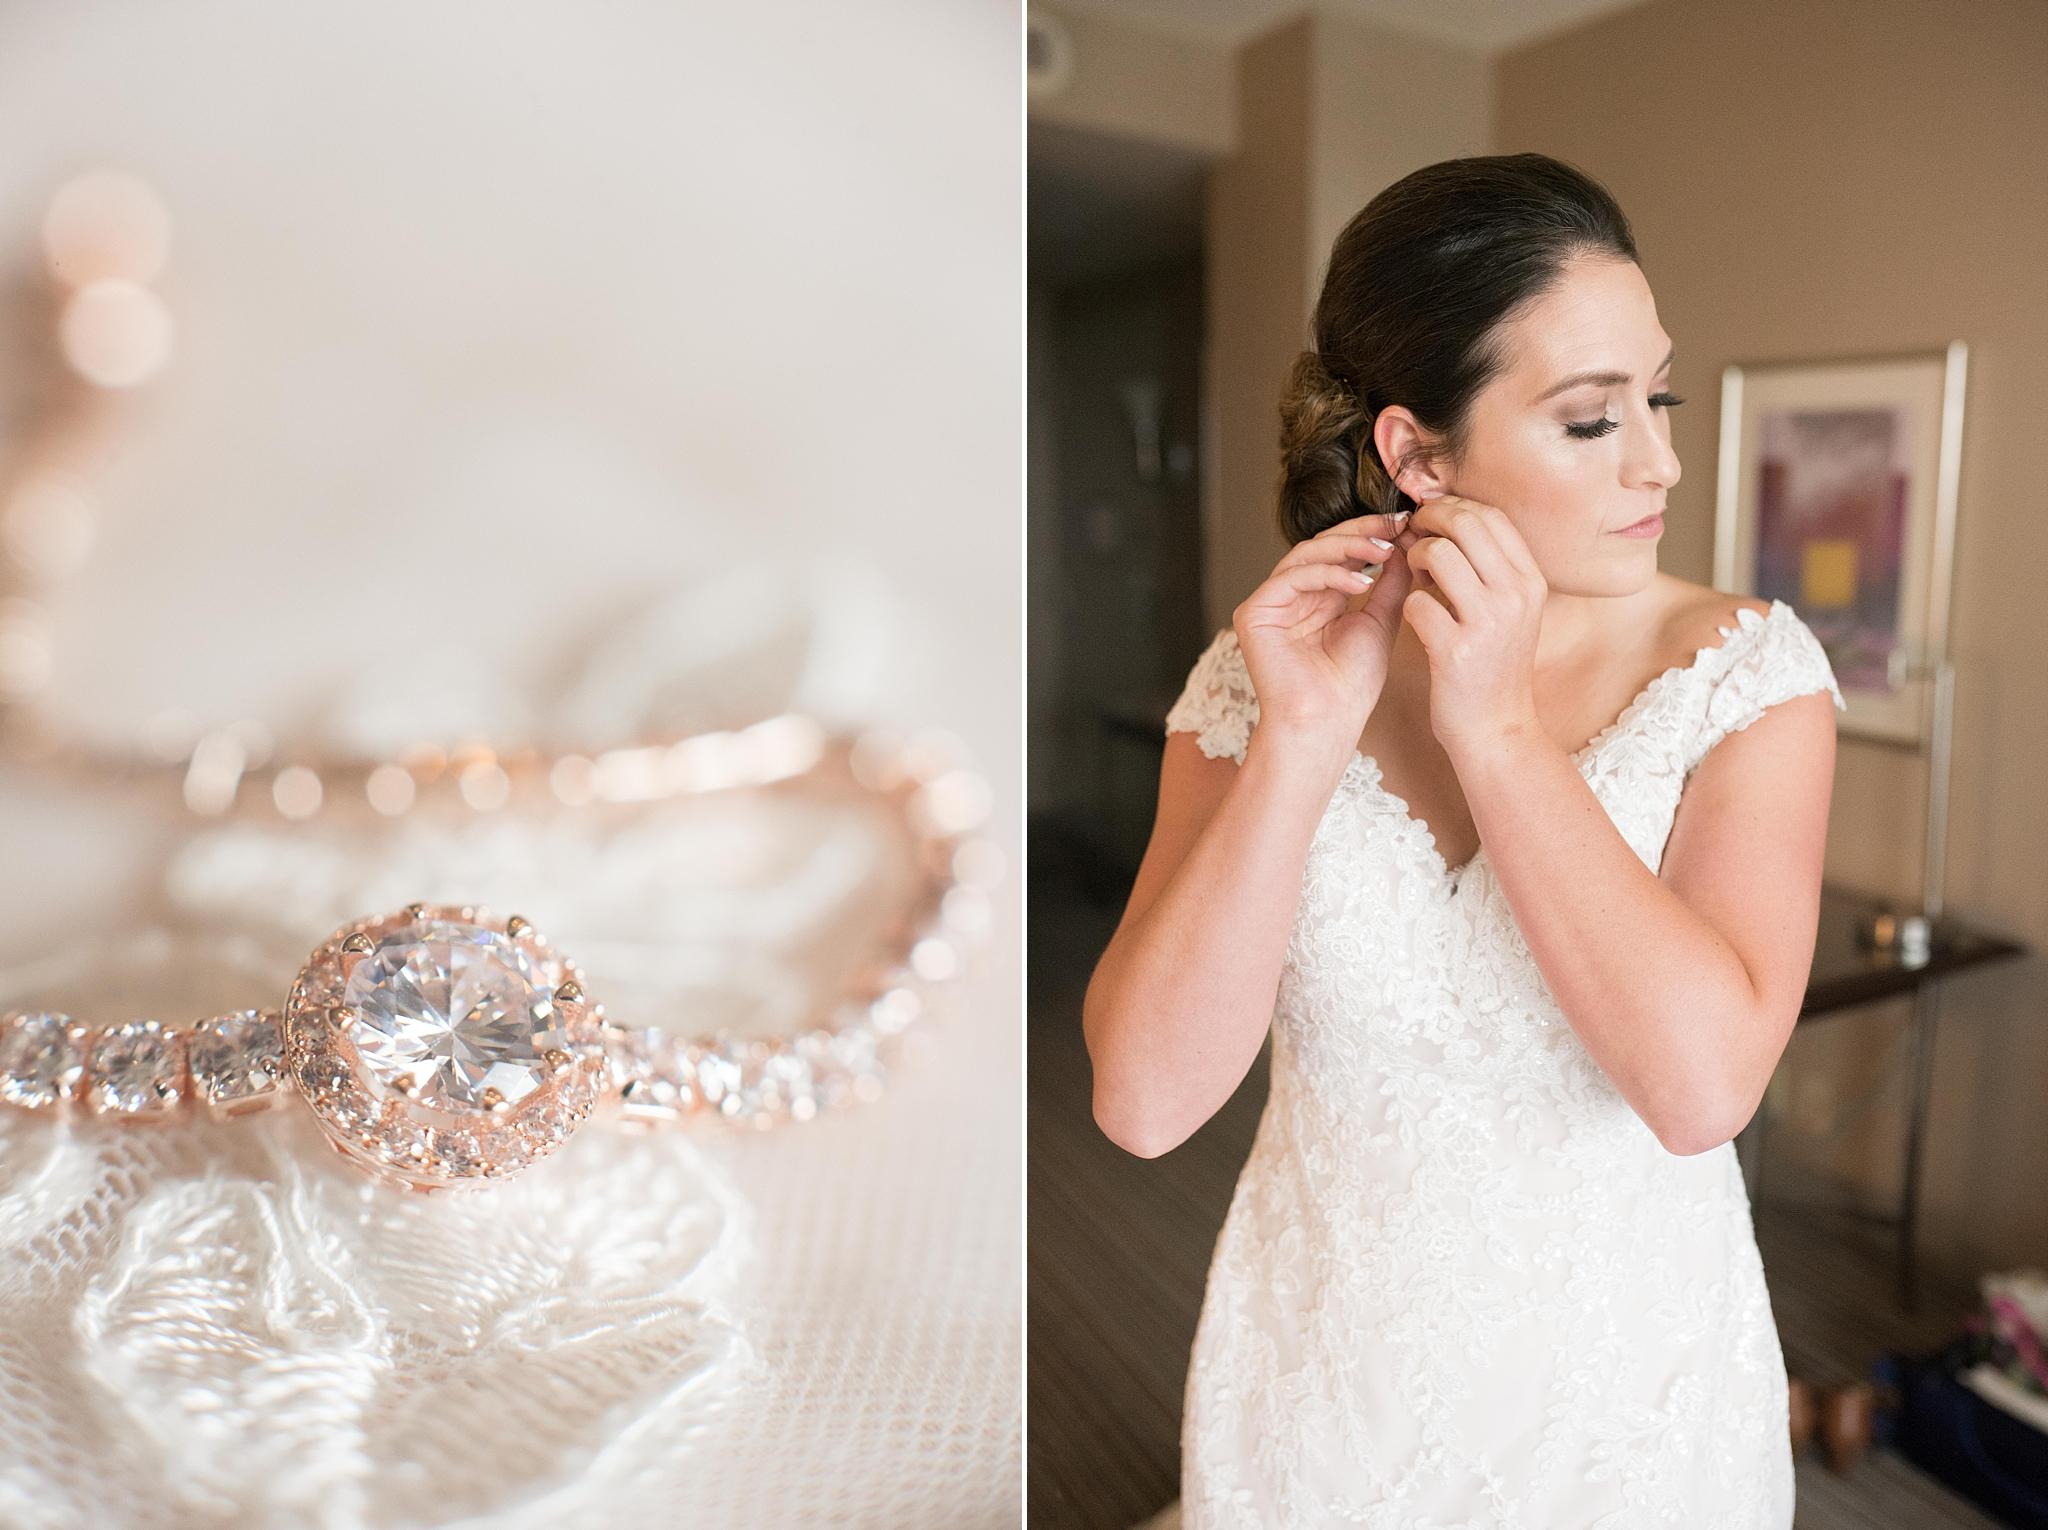 San Felipe de Nero and Hyatt Downtown wedding, bridal elegance by darlene, jewelry enchanted jewelers, dj cutmaster music, albuquerque wedding photographer, blush and grey